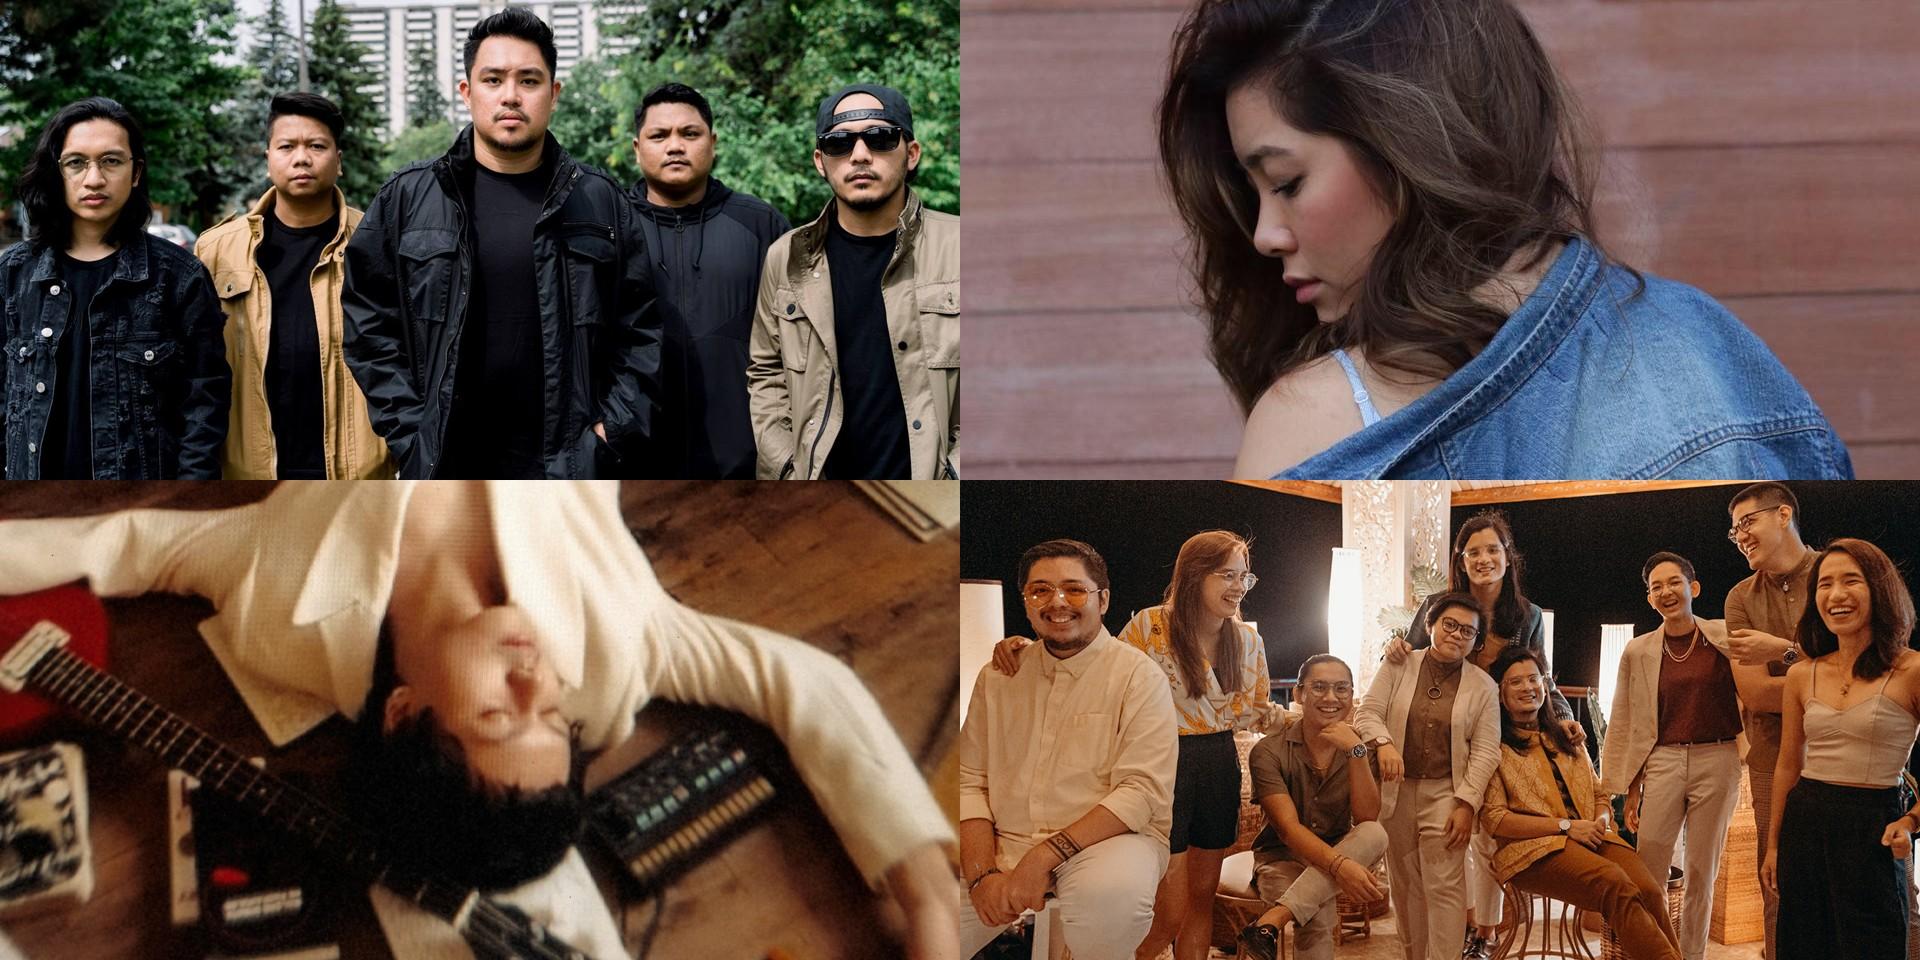 December Avenue, Zild, Moira Dela Torre, Ben&Ben, and more release new music – listen